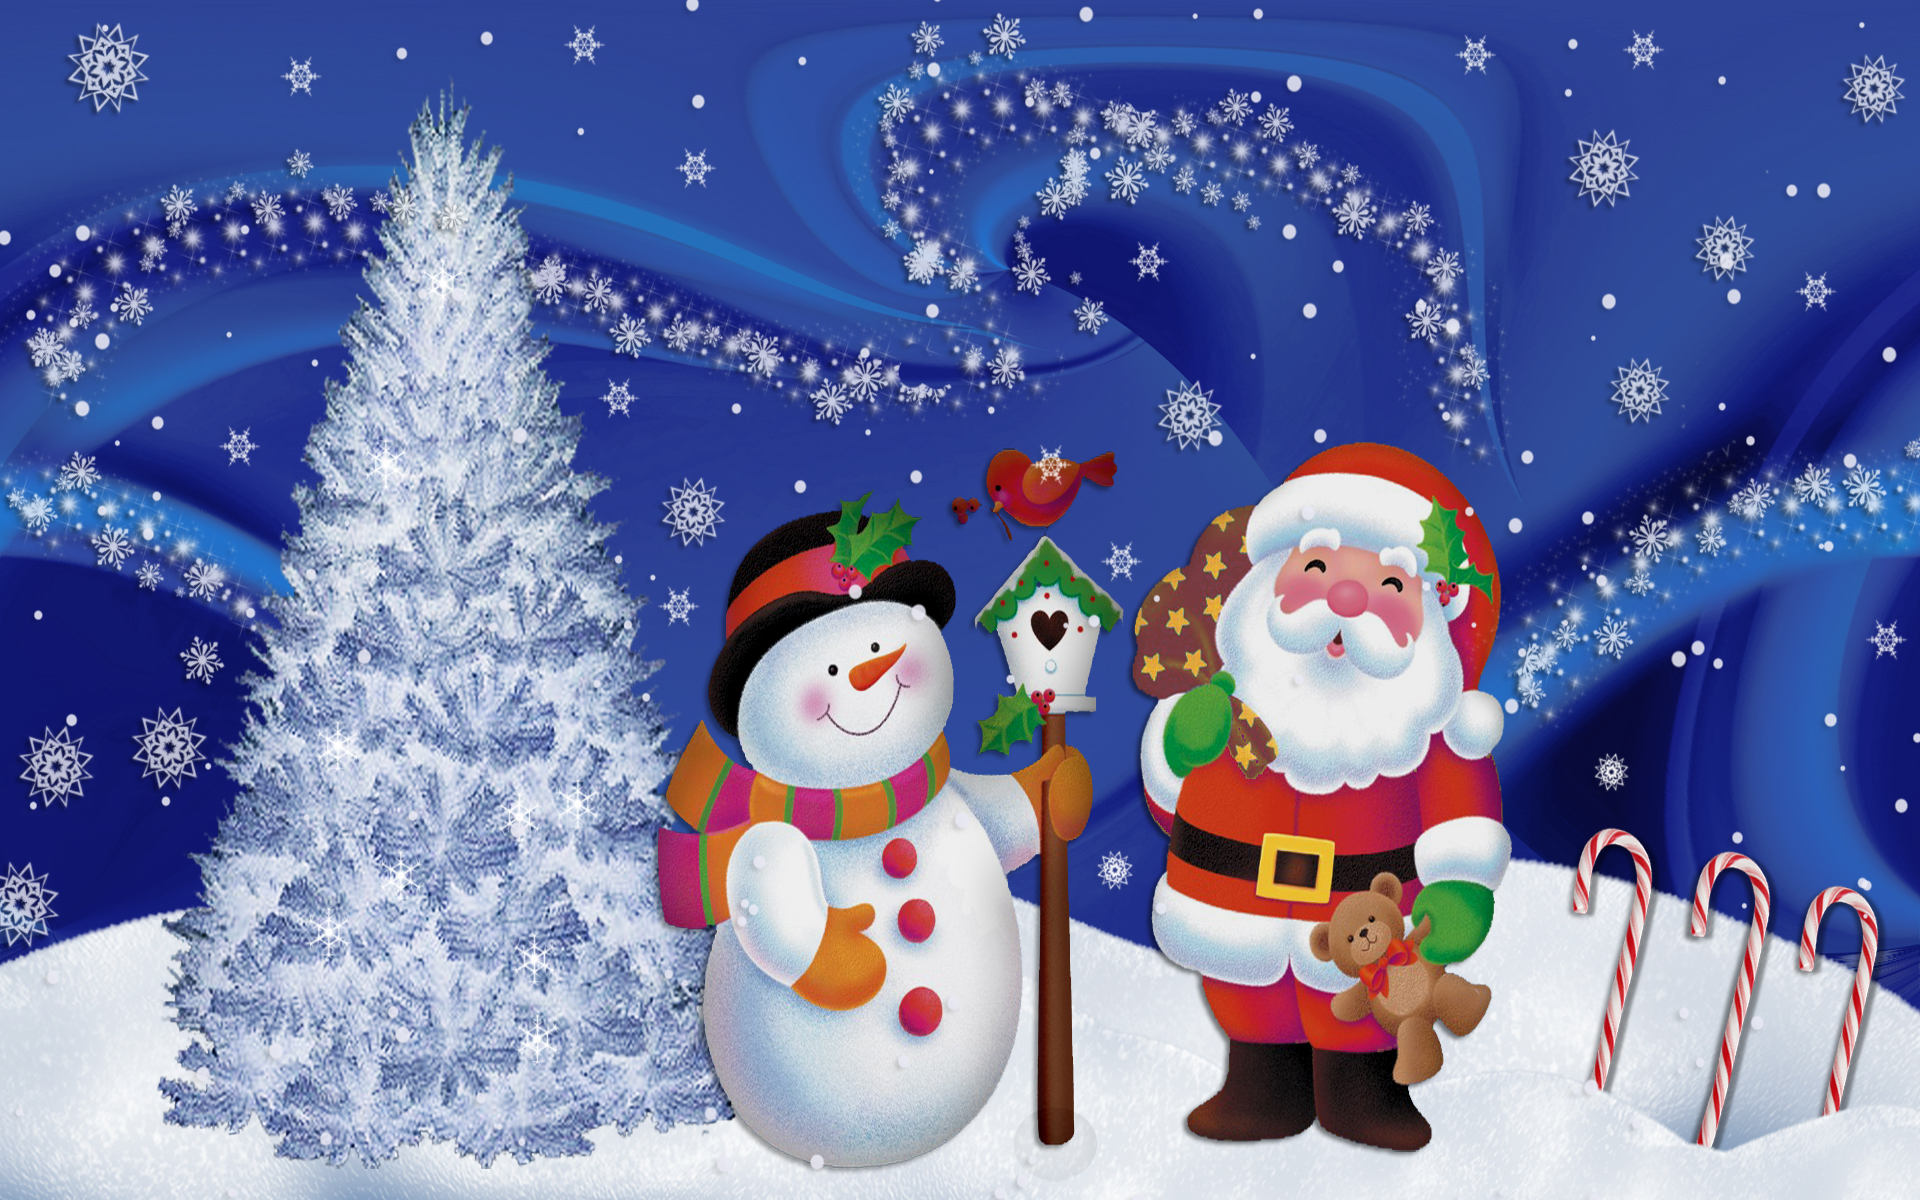 merry christmas wallpapers santa